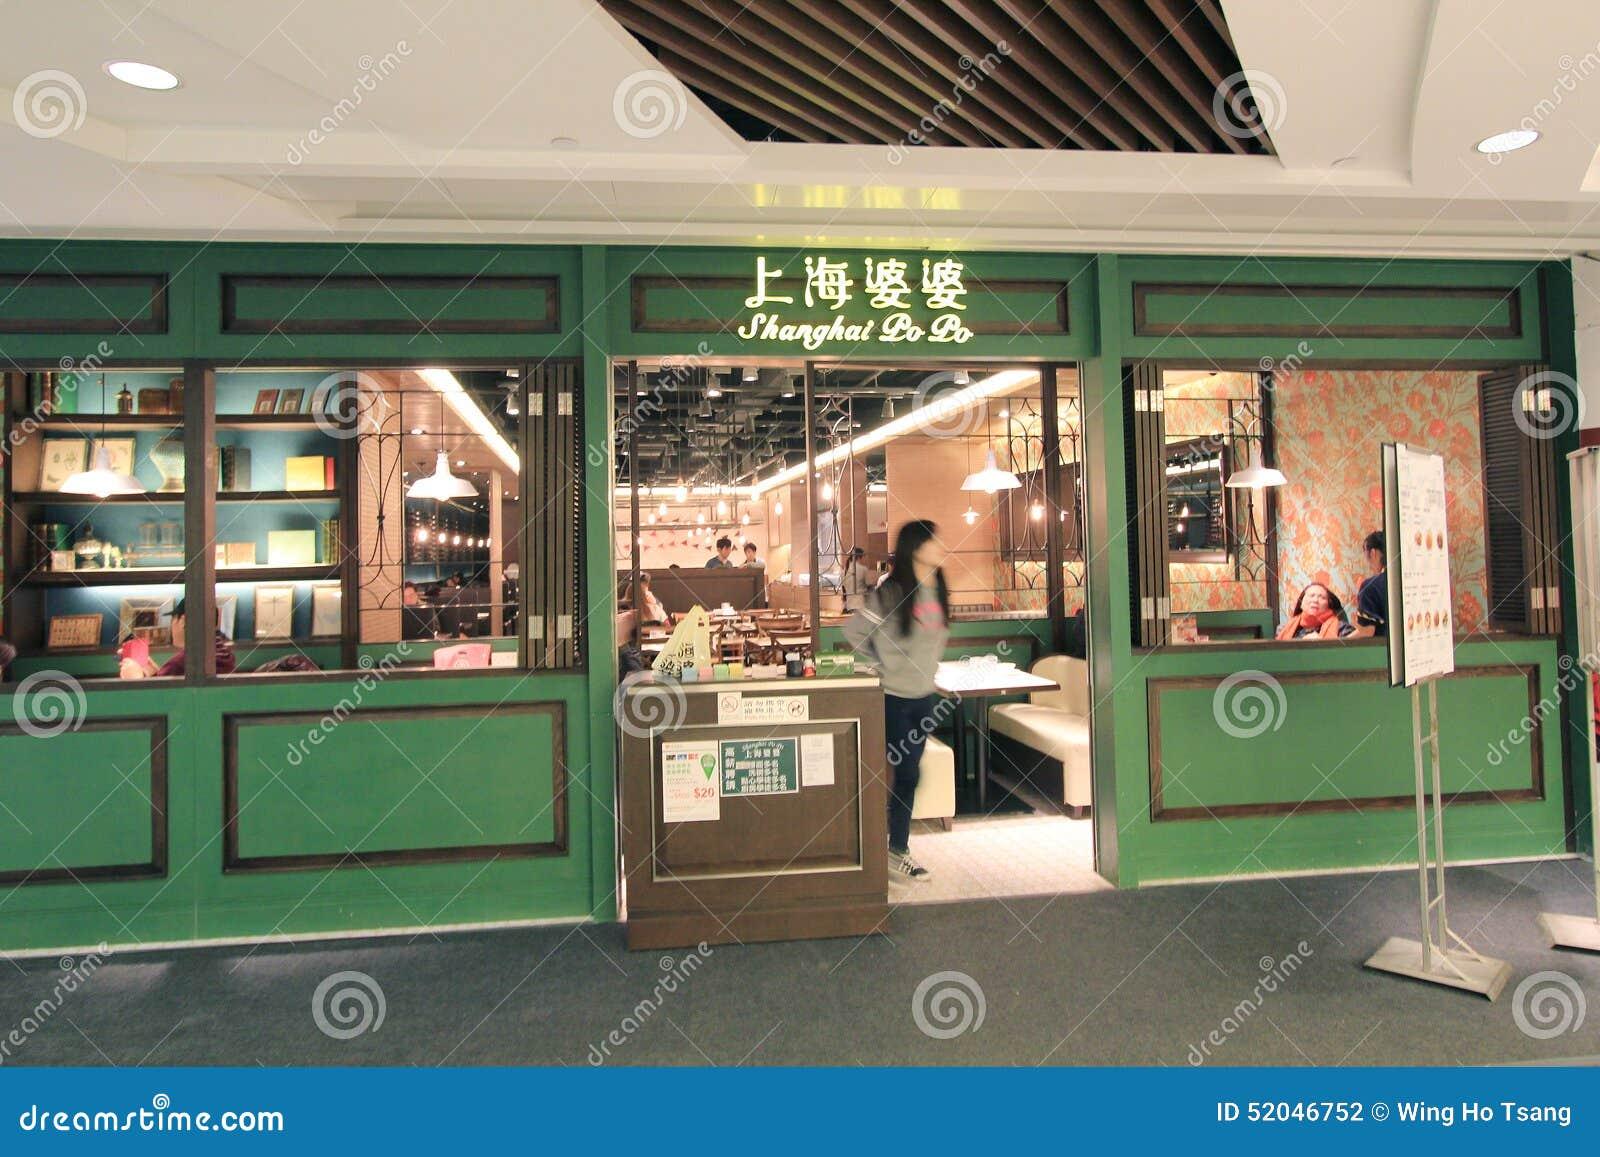 Szanghaj Po Po restauracja w Hong kong